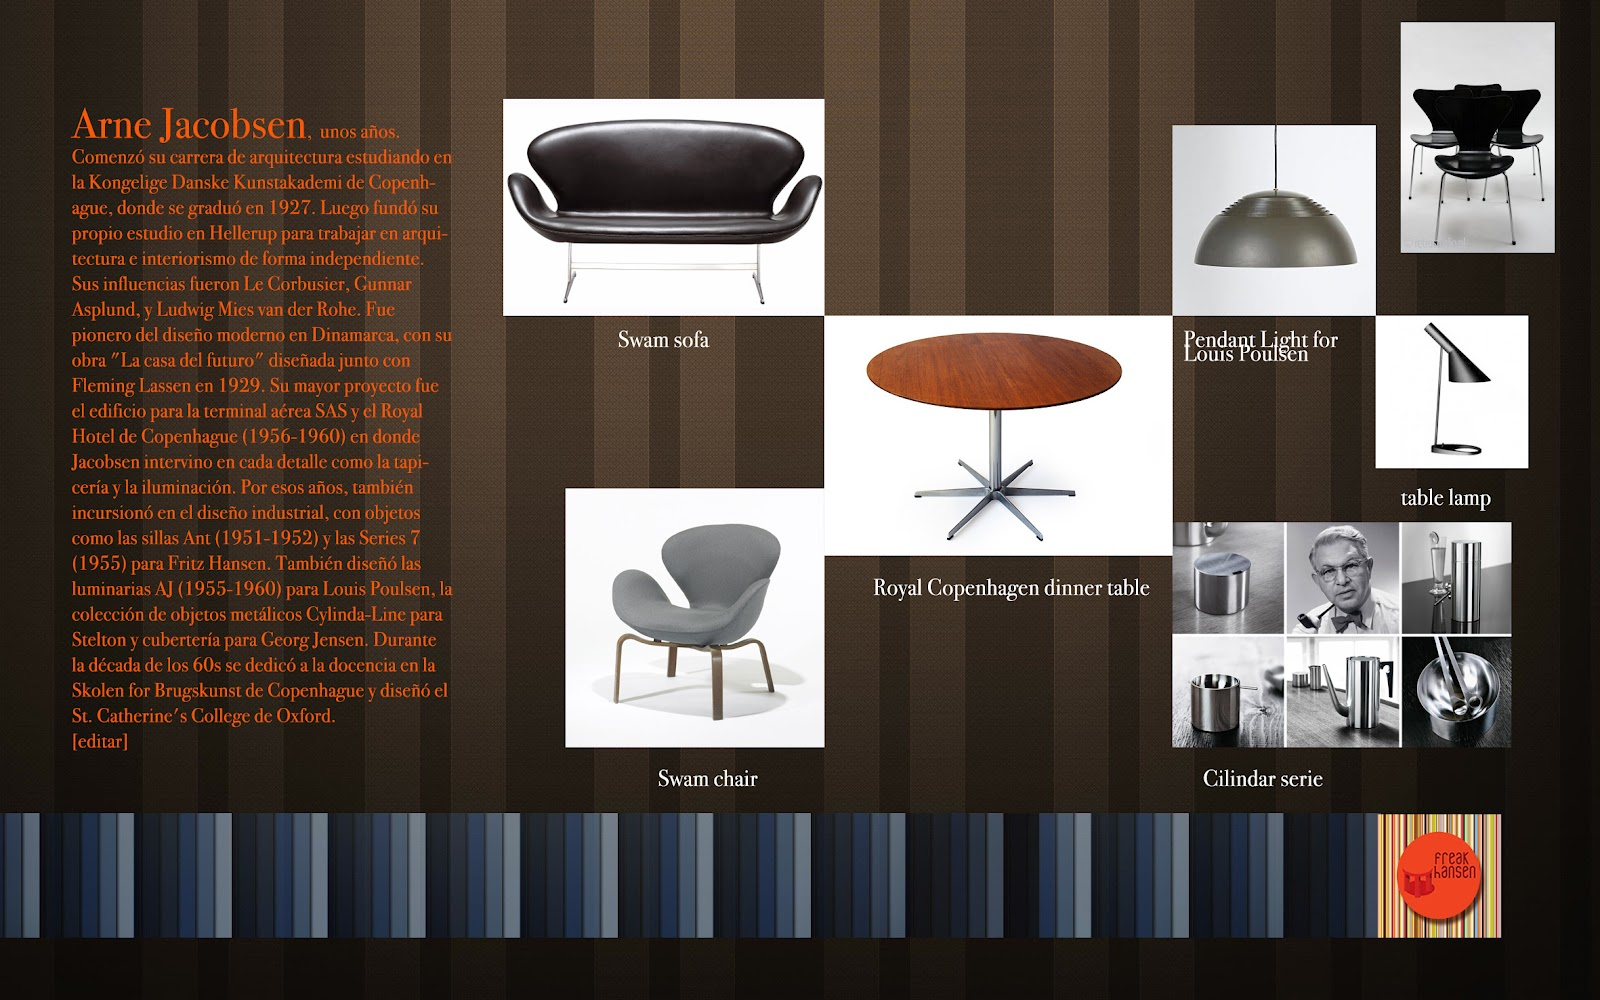 freak h nsen mid century scandinavian furniture vintage jacobsen in freak hansen. Black Bedroom Furniture Sets. Home Design Ideas